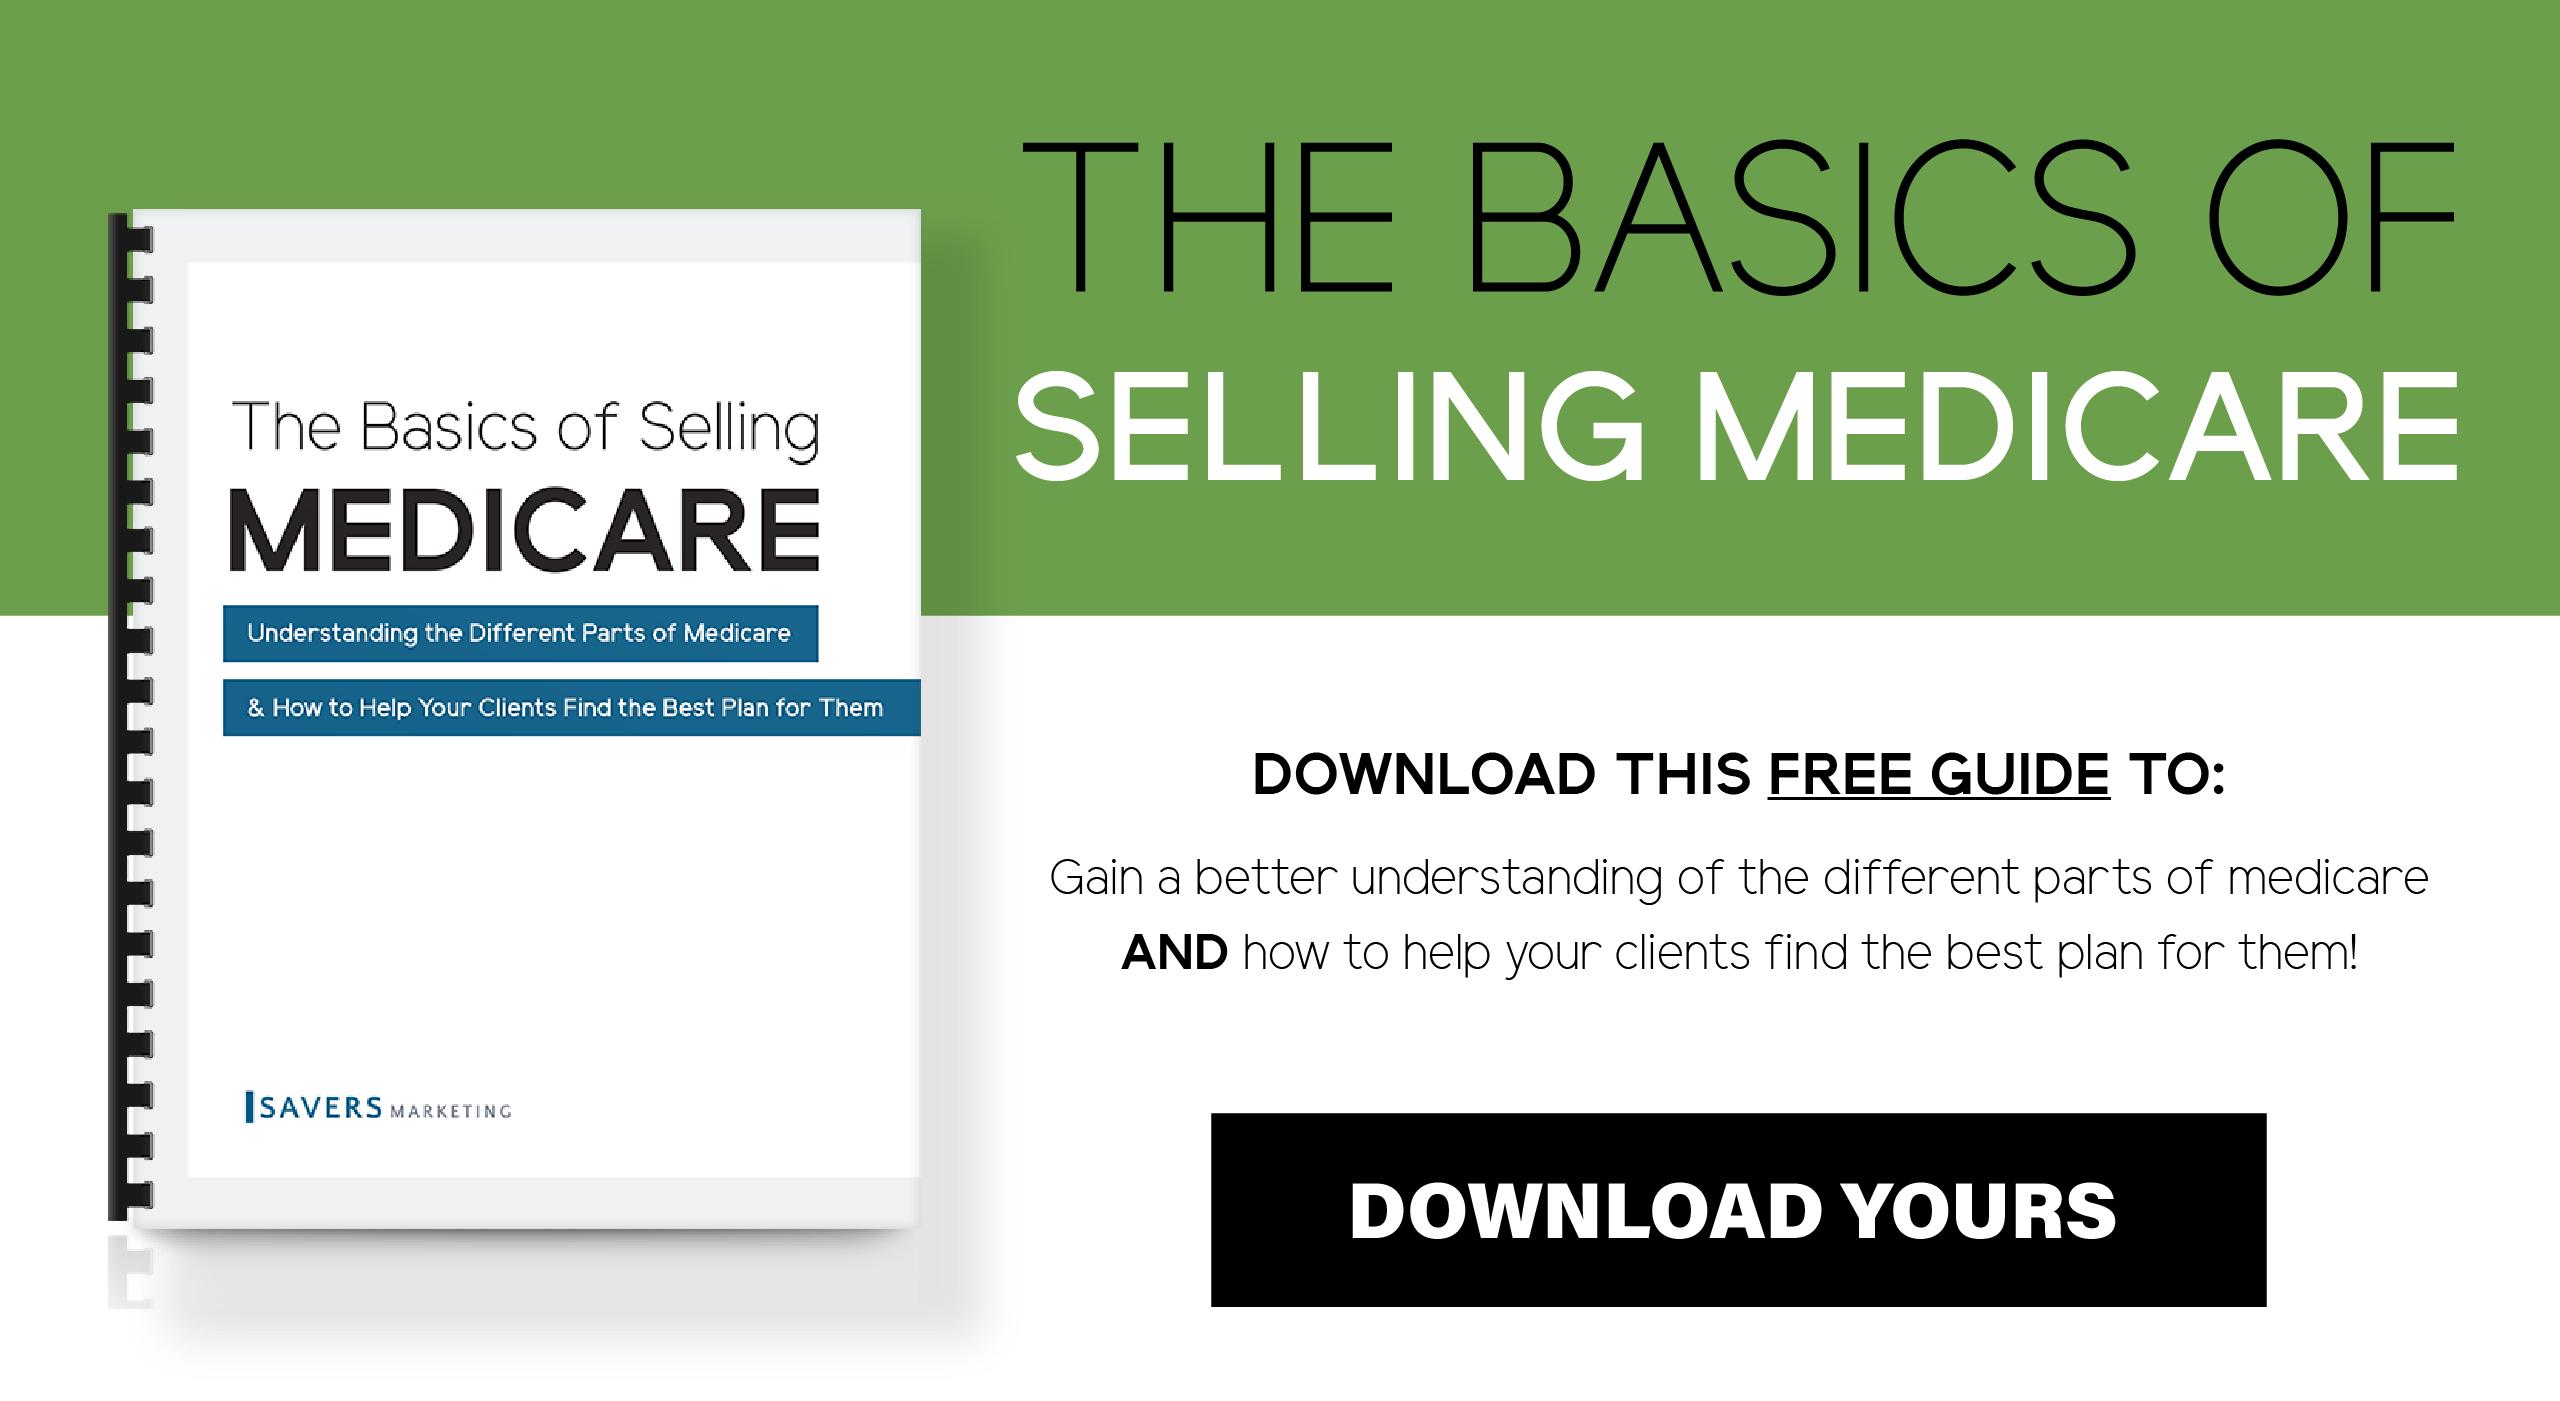 Basics of Selling Medicare